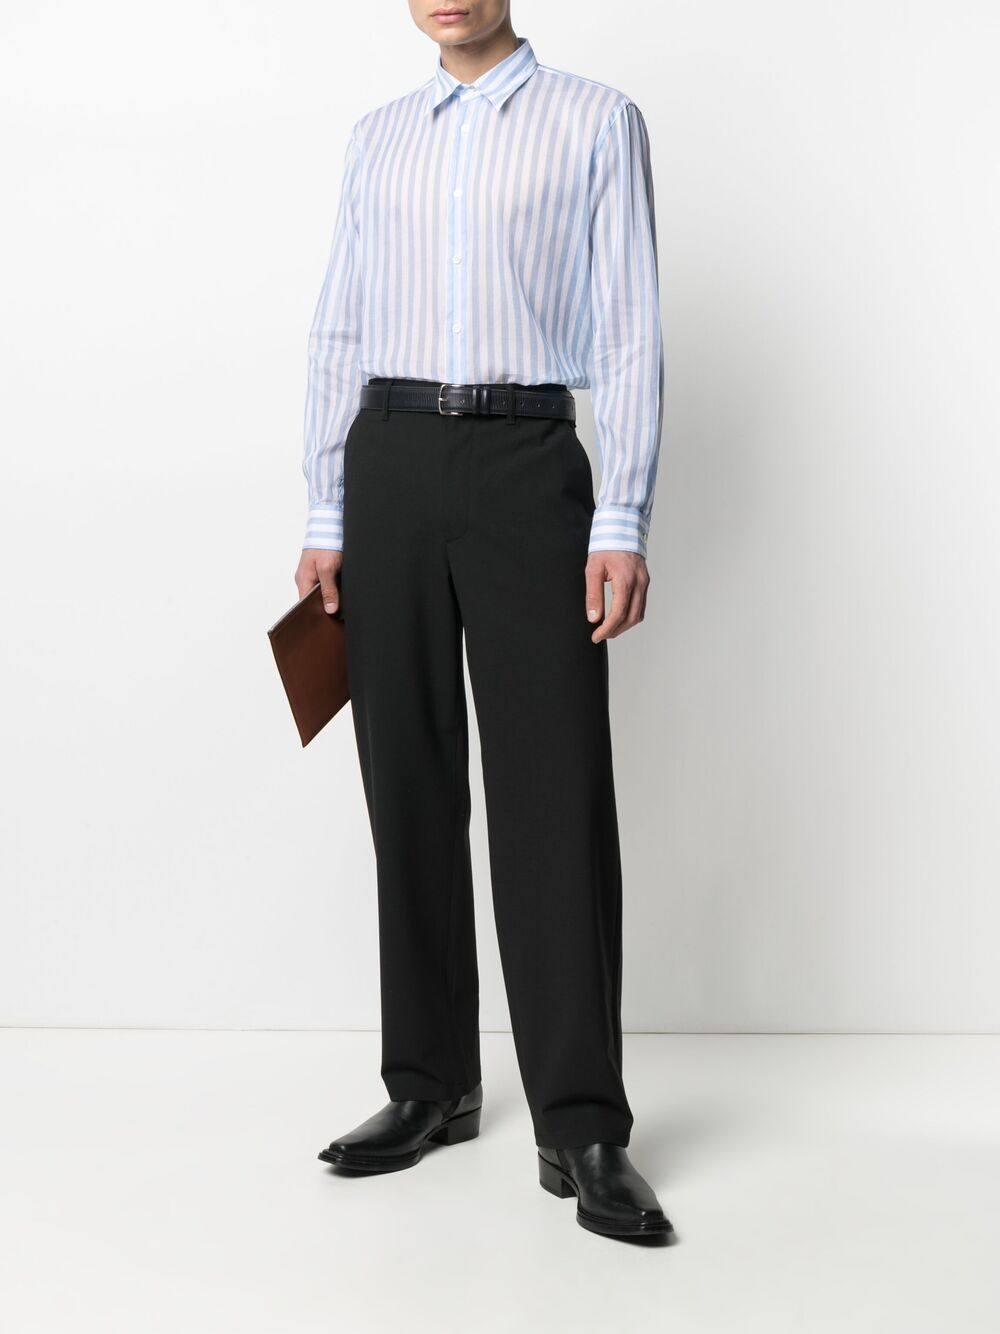 Sunflower camicia a righe uomo SUNFLOWER | Camicie | 1088205